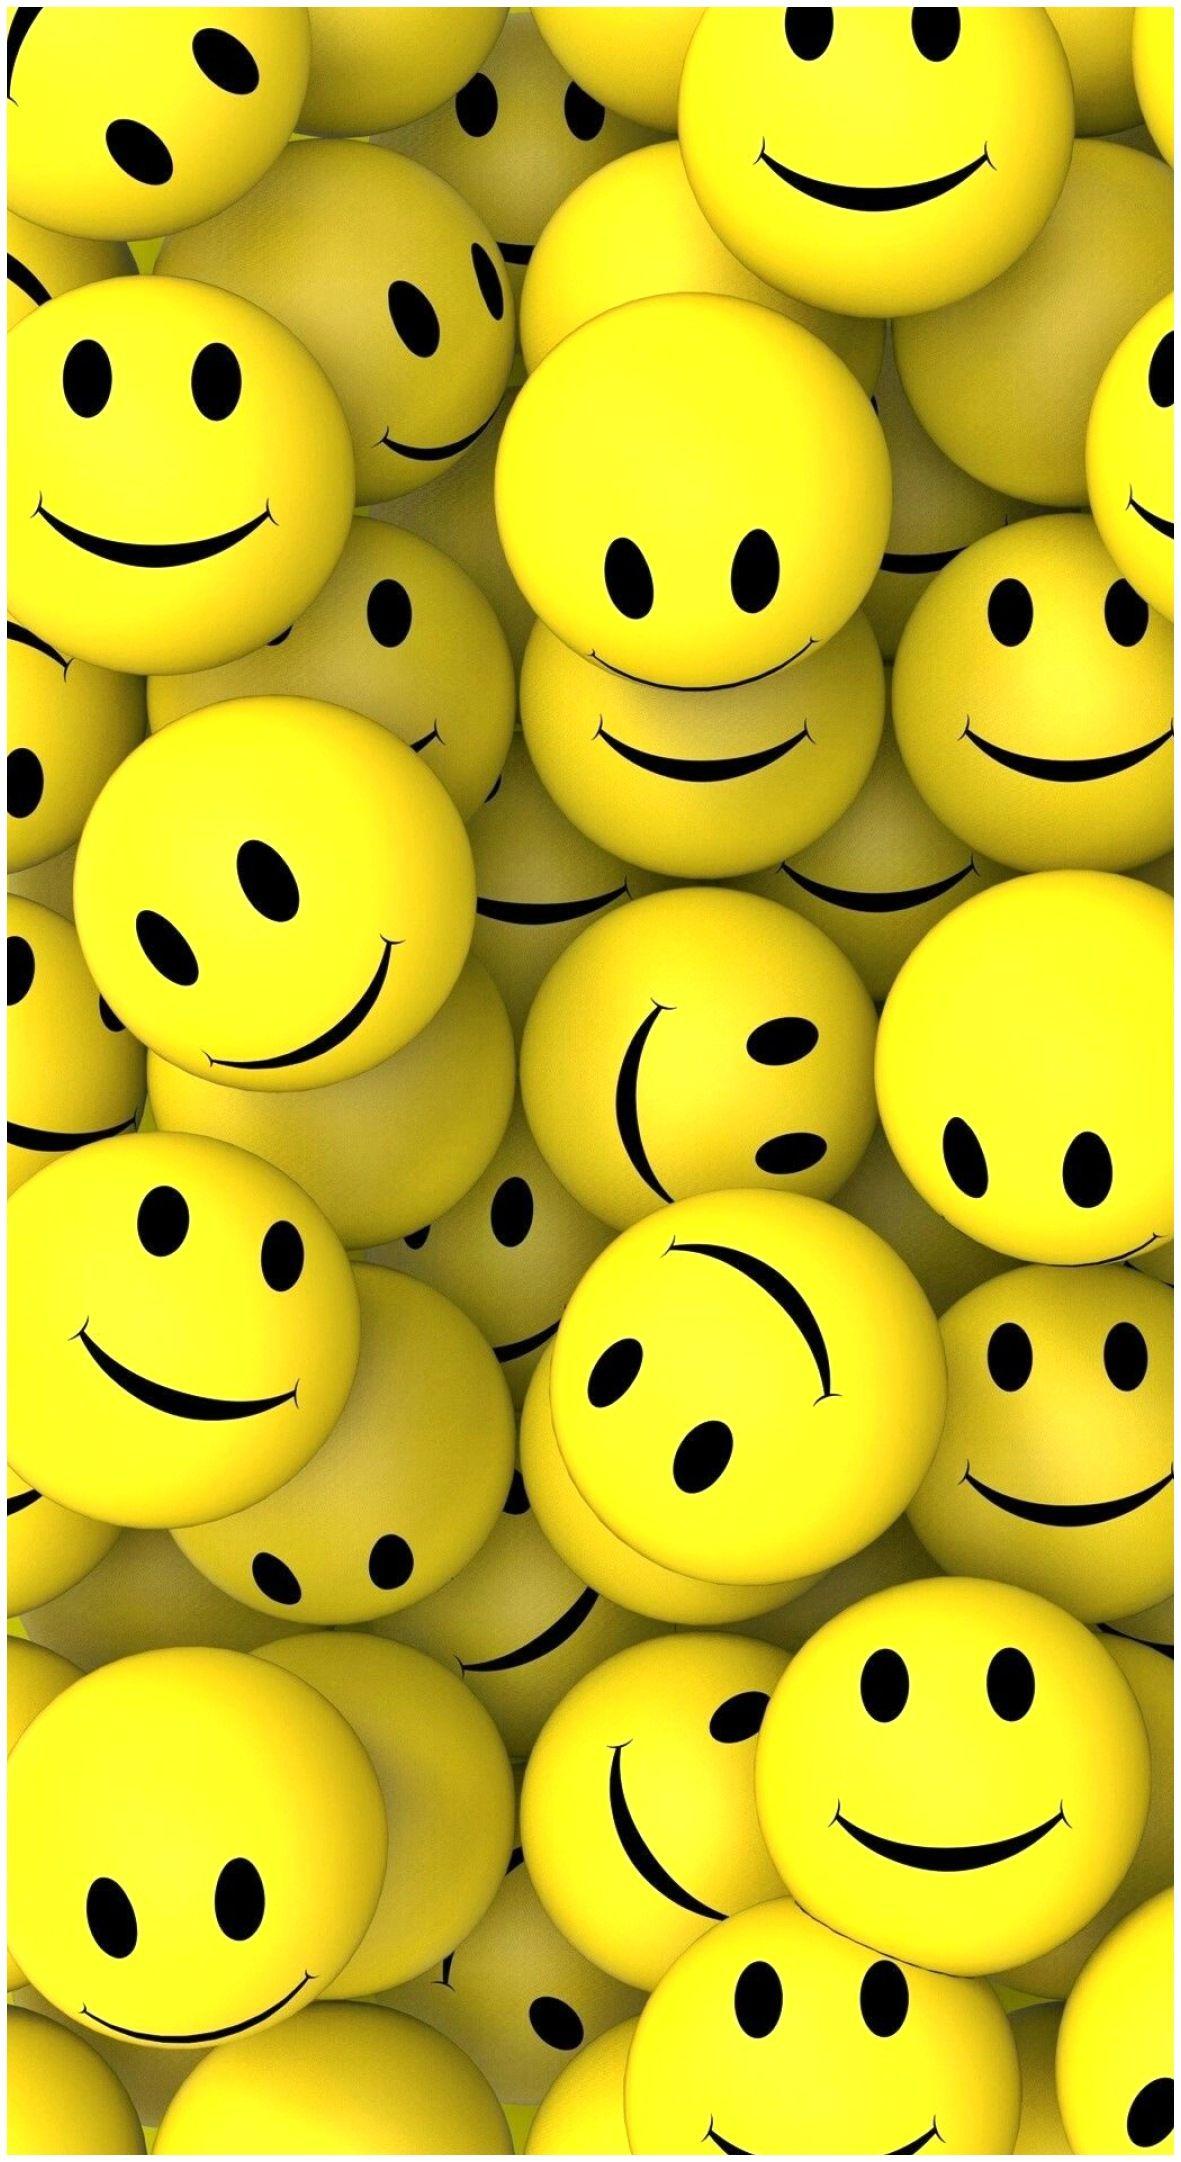 Emoji Url S Are Cool In 2021 4k Wallpaper For Mobile Emoji Wallpaper Laughing Emoji Wallpaper 3d cool emoji picture wallpaper